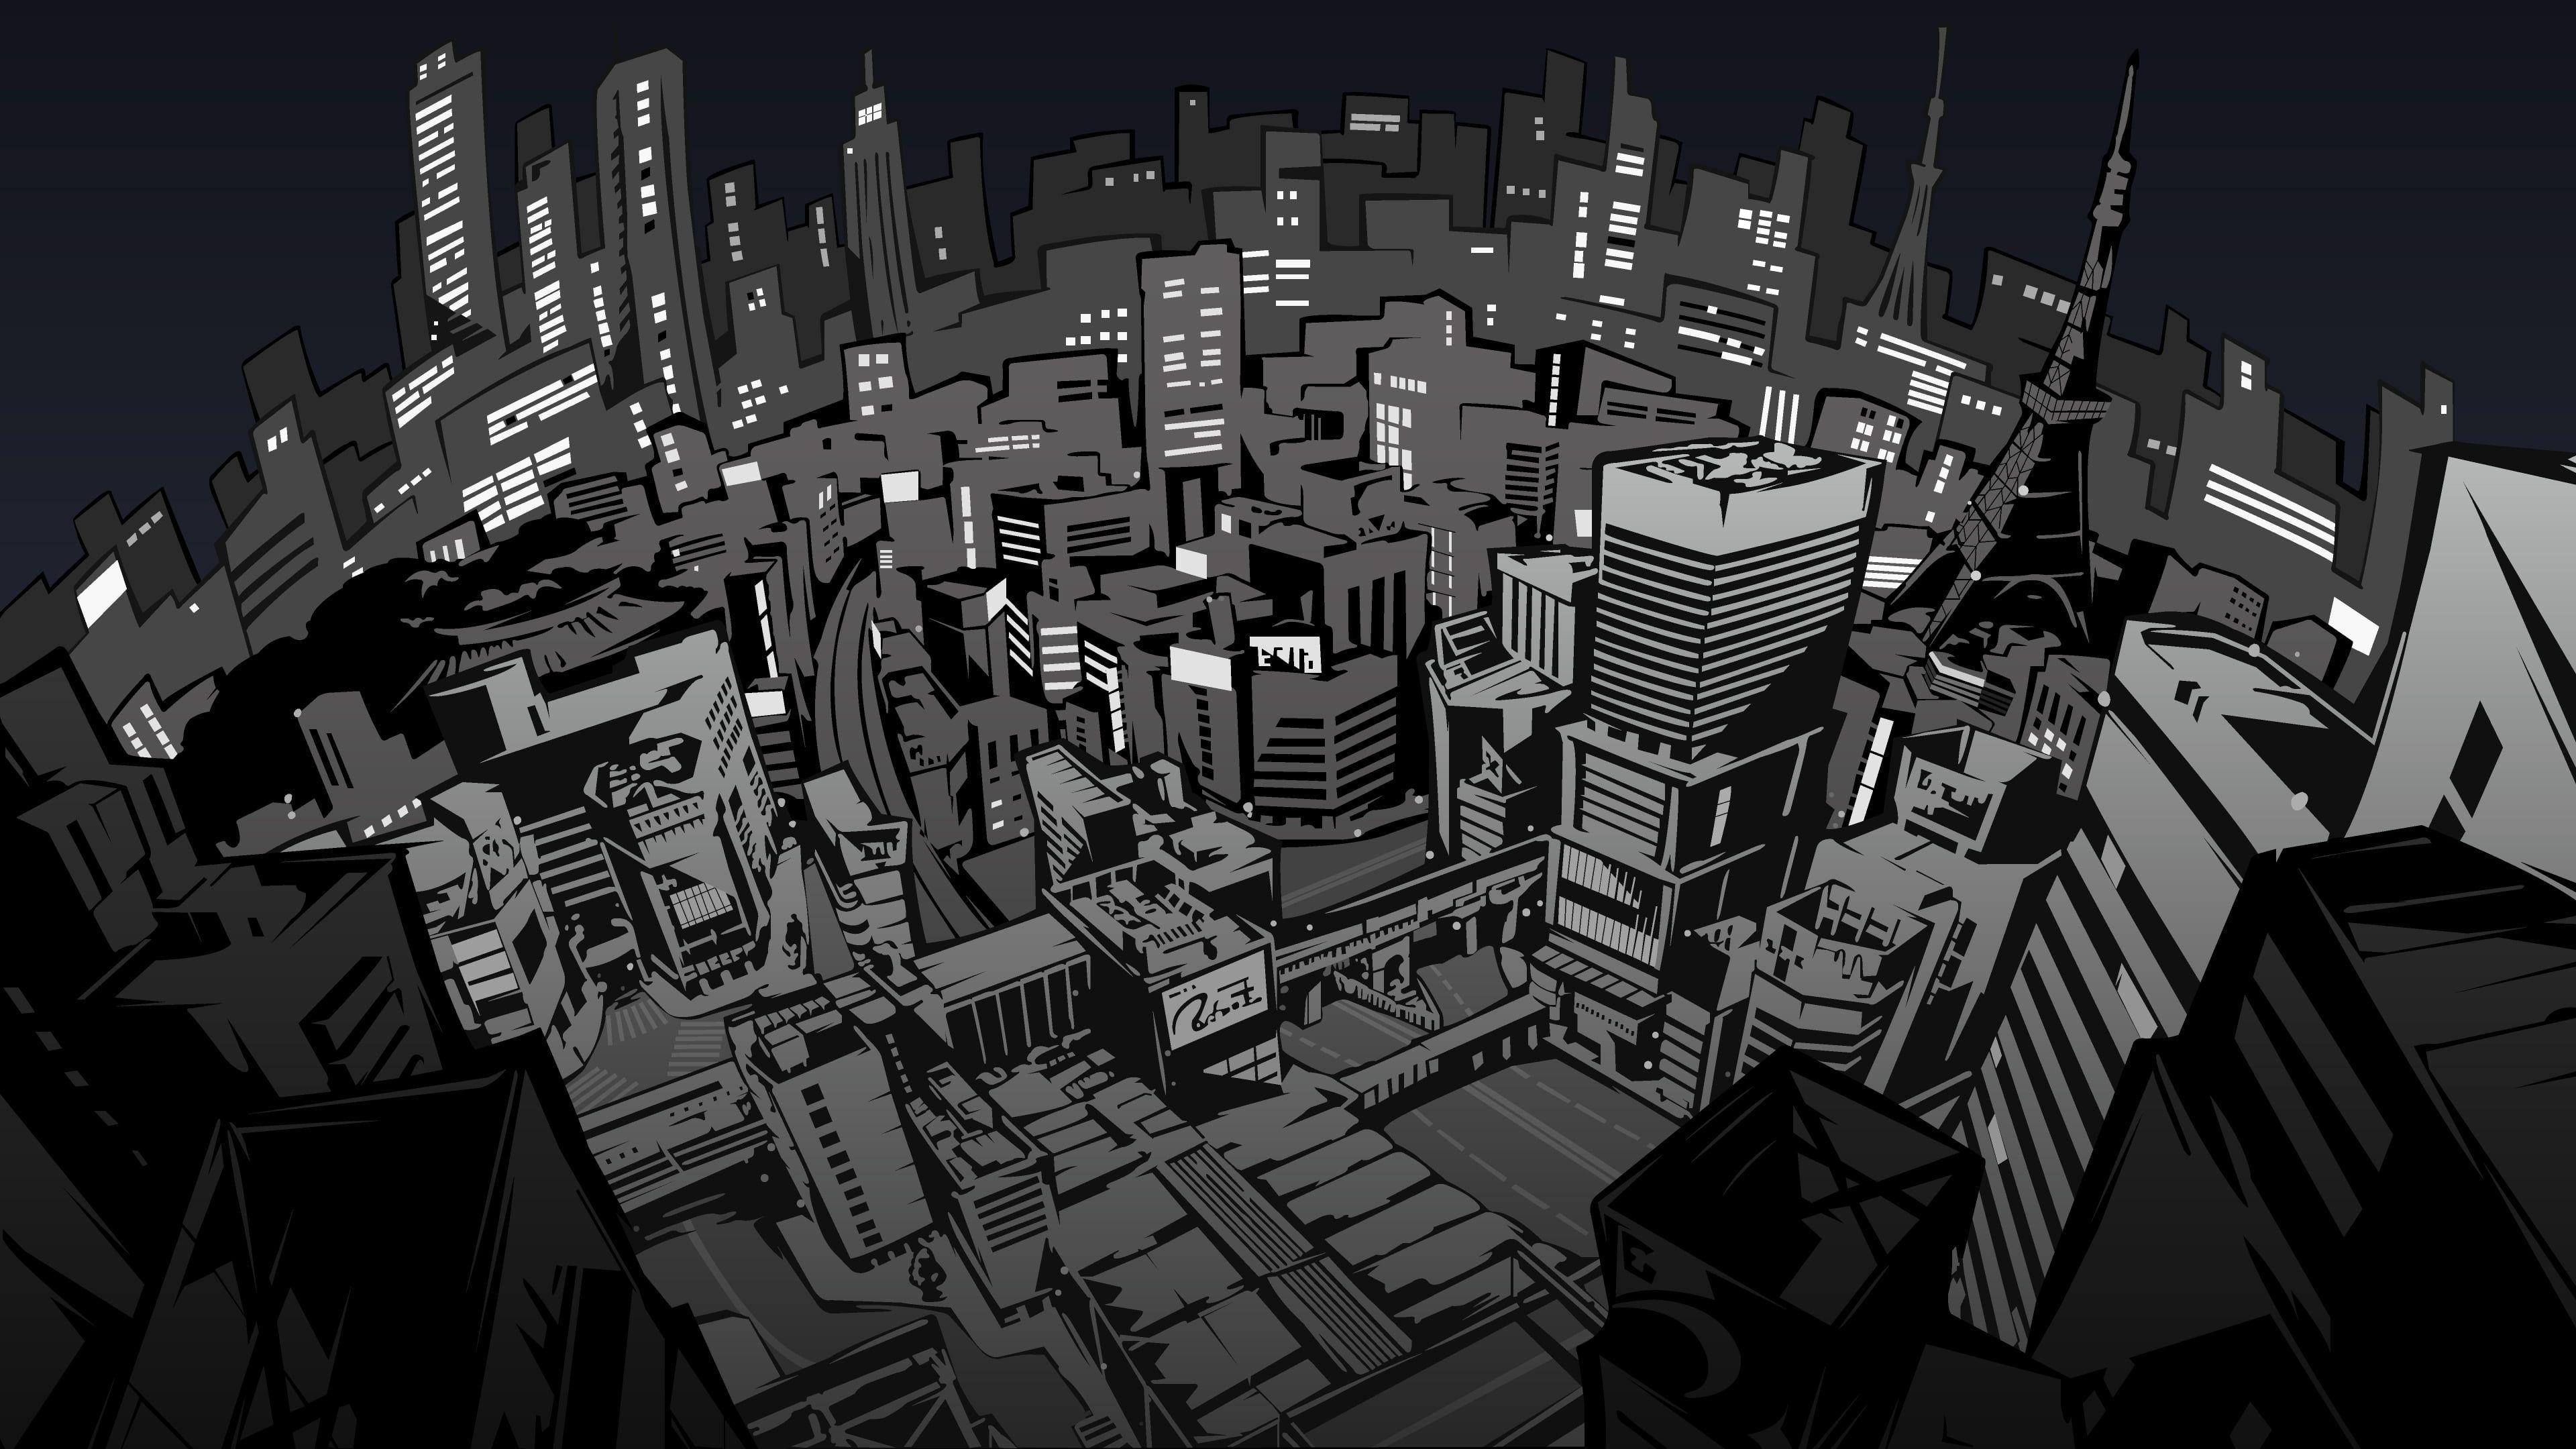 Animated City Illustration Persona 5 Video Games Persona Series 4k Wallpaper Hdwallpaper Desktop Persona 5 City Illustration Persona